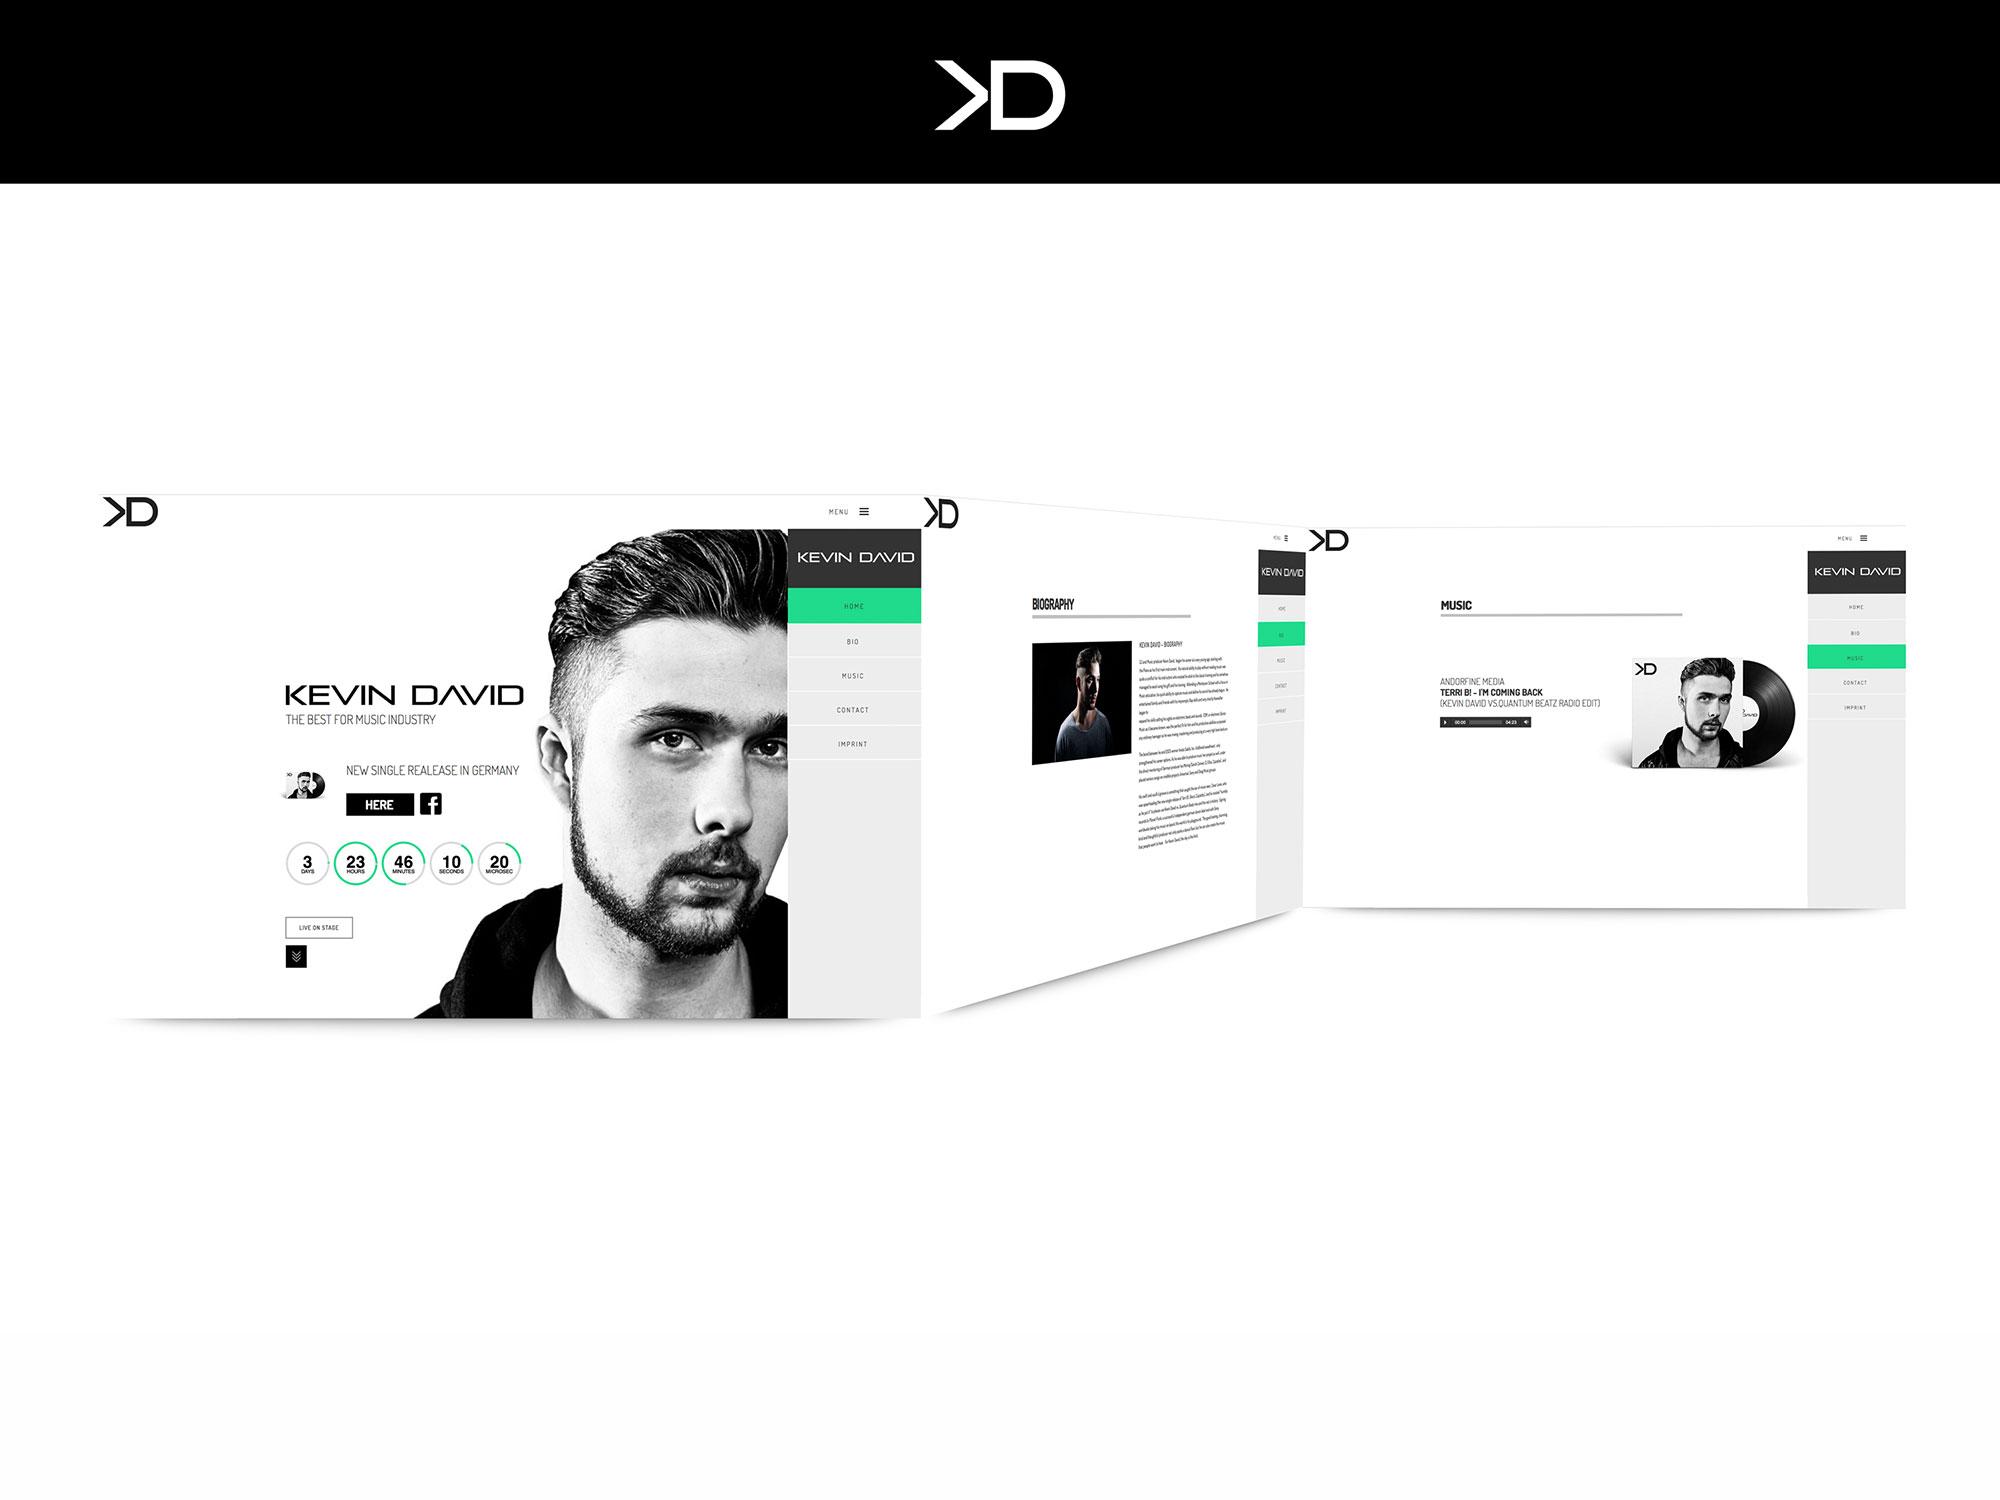 Kevin_David_Homepage_01